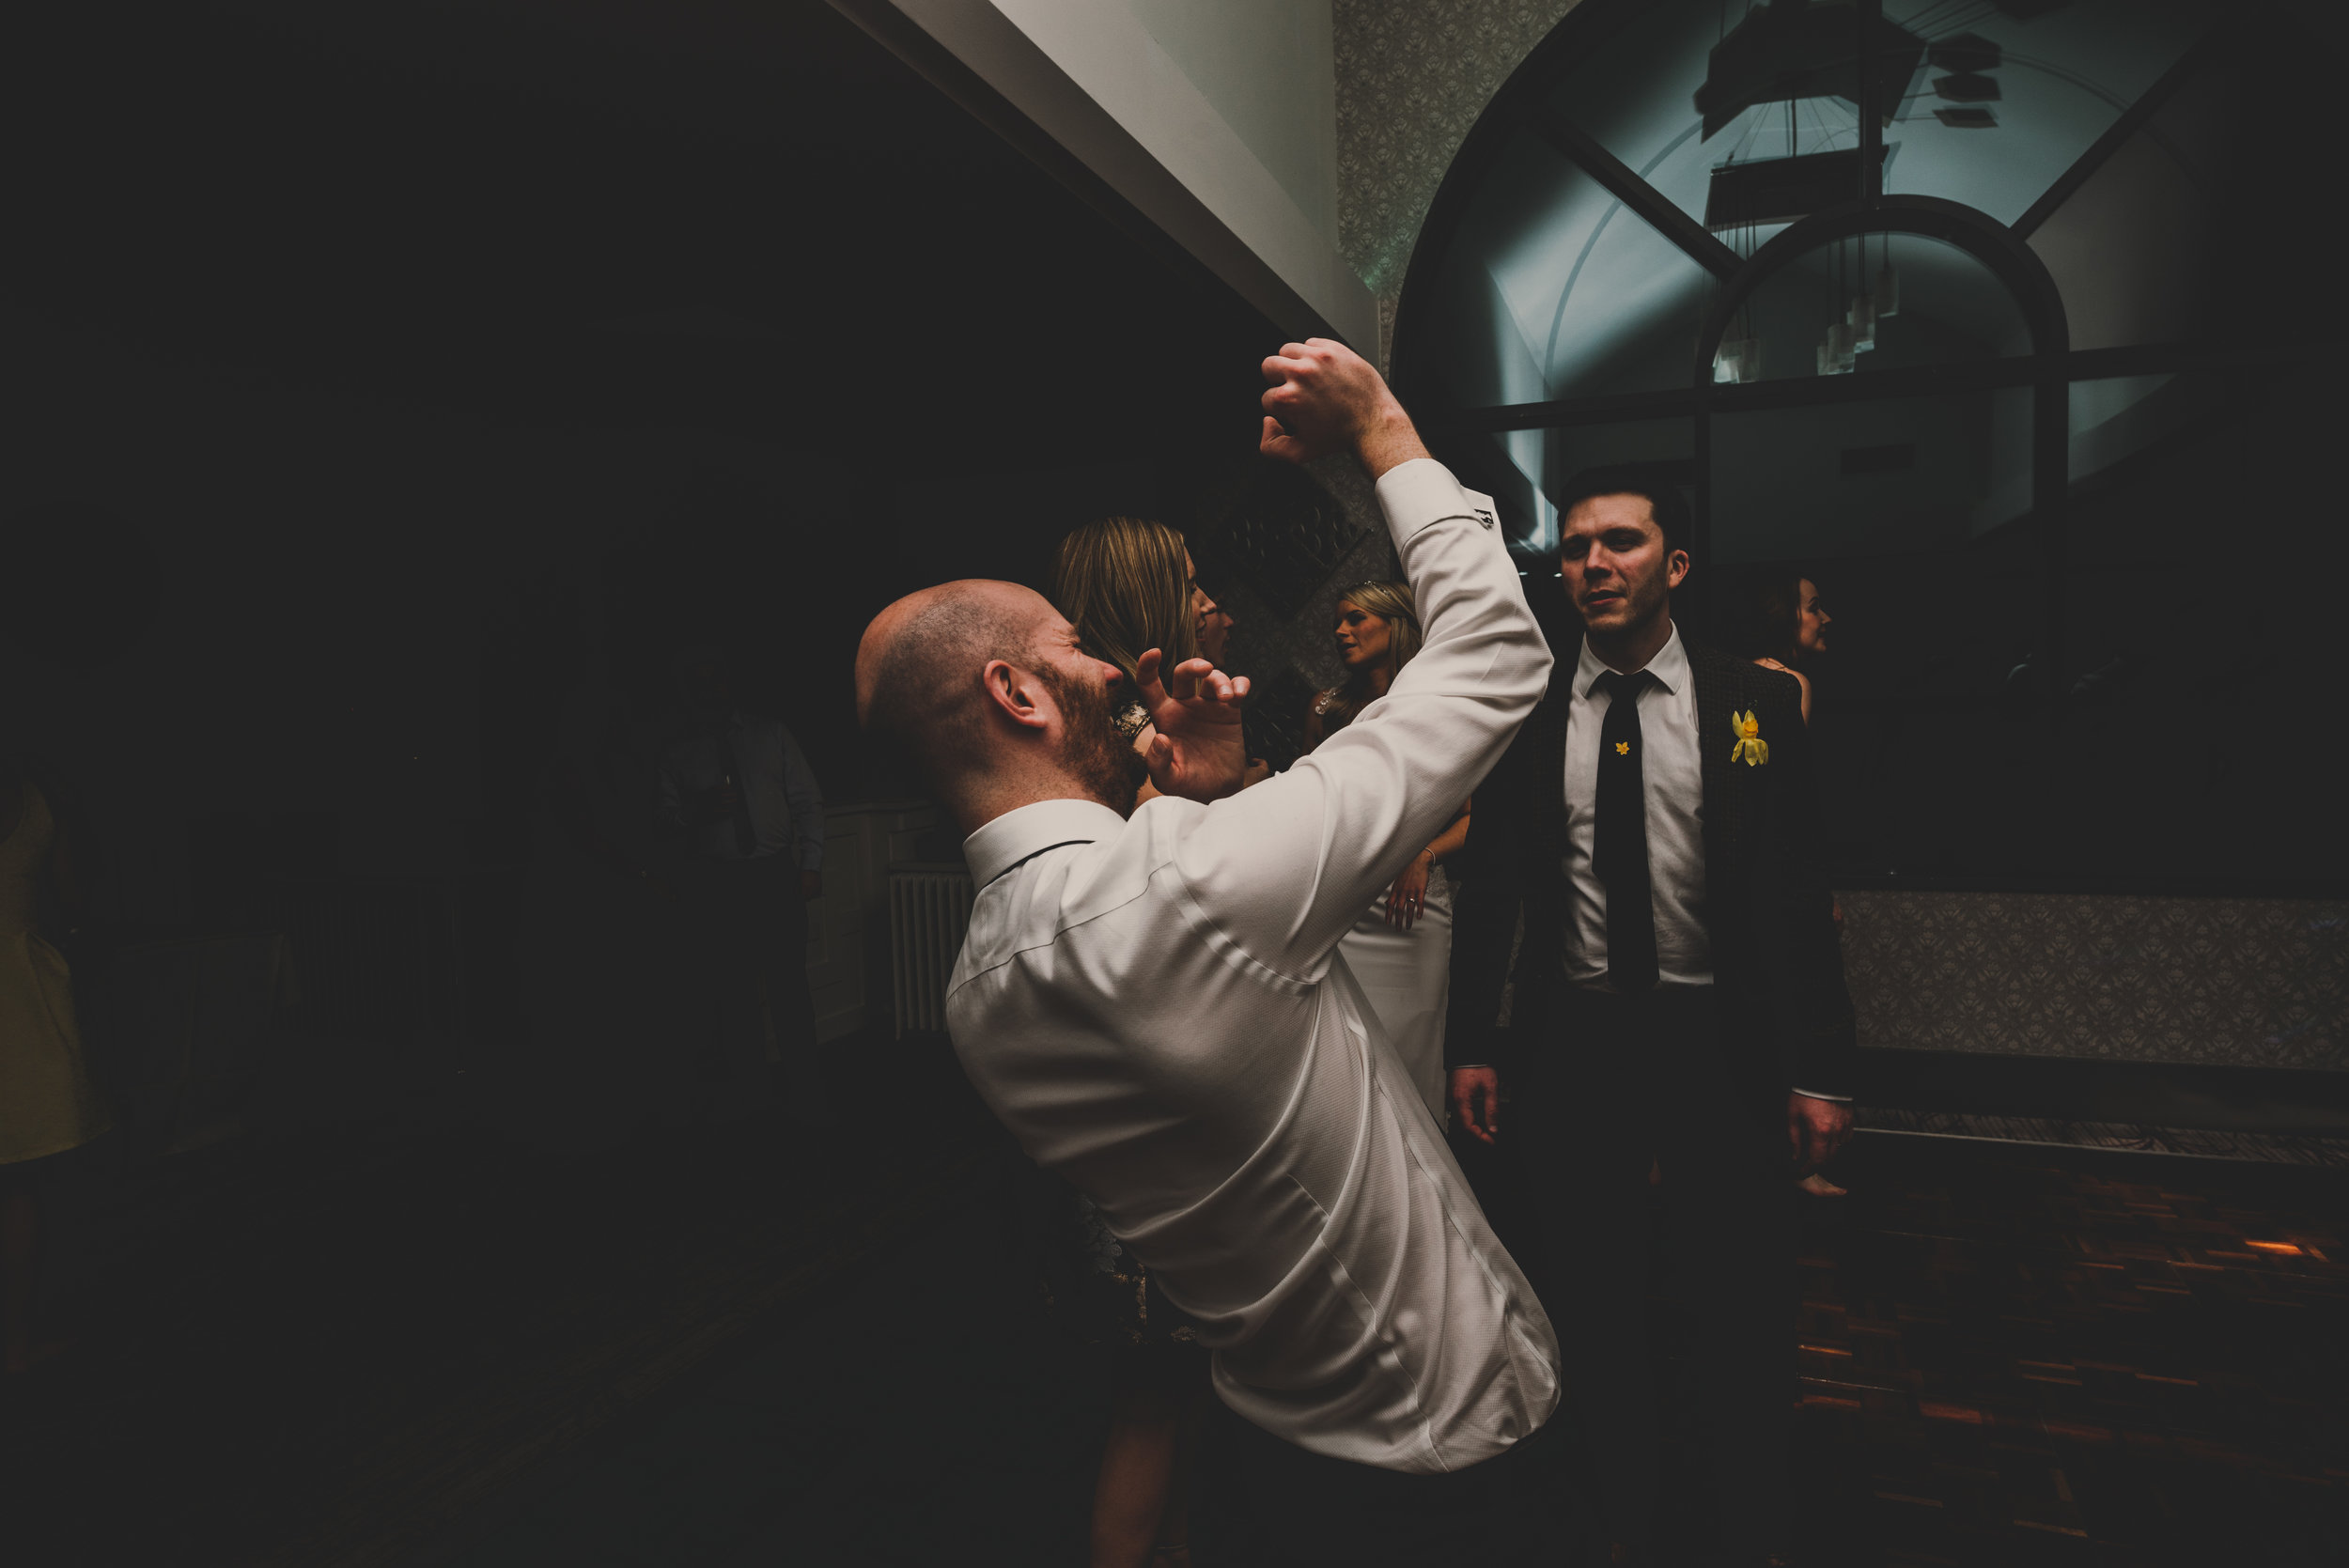 wales-wedding-photographer (70).jpg